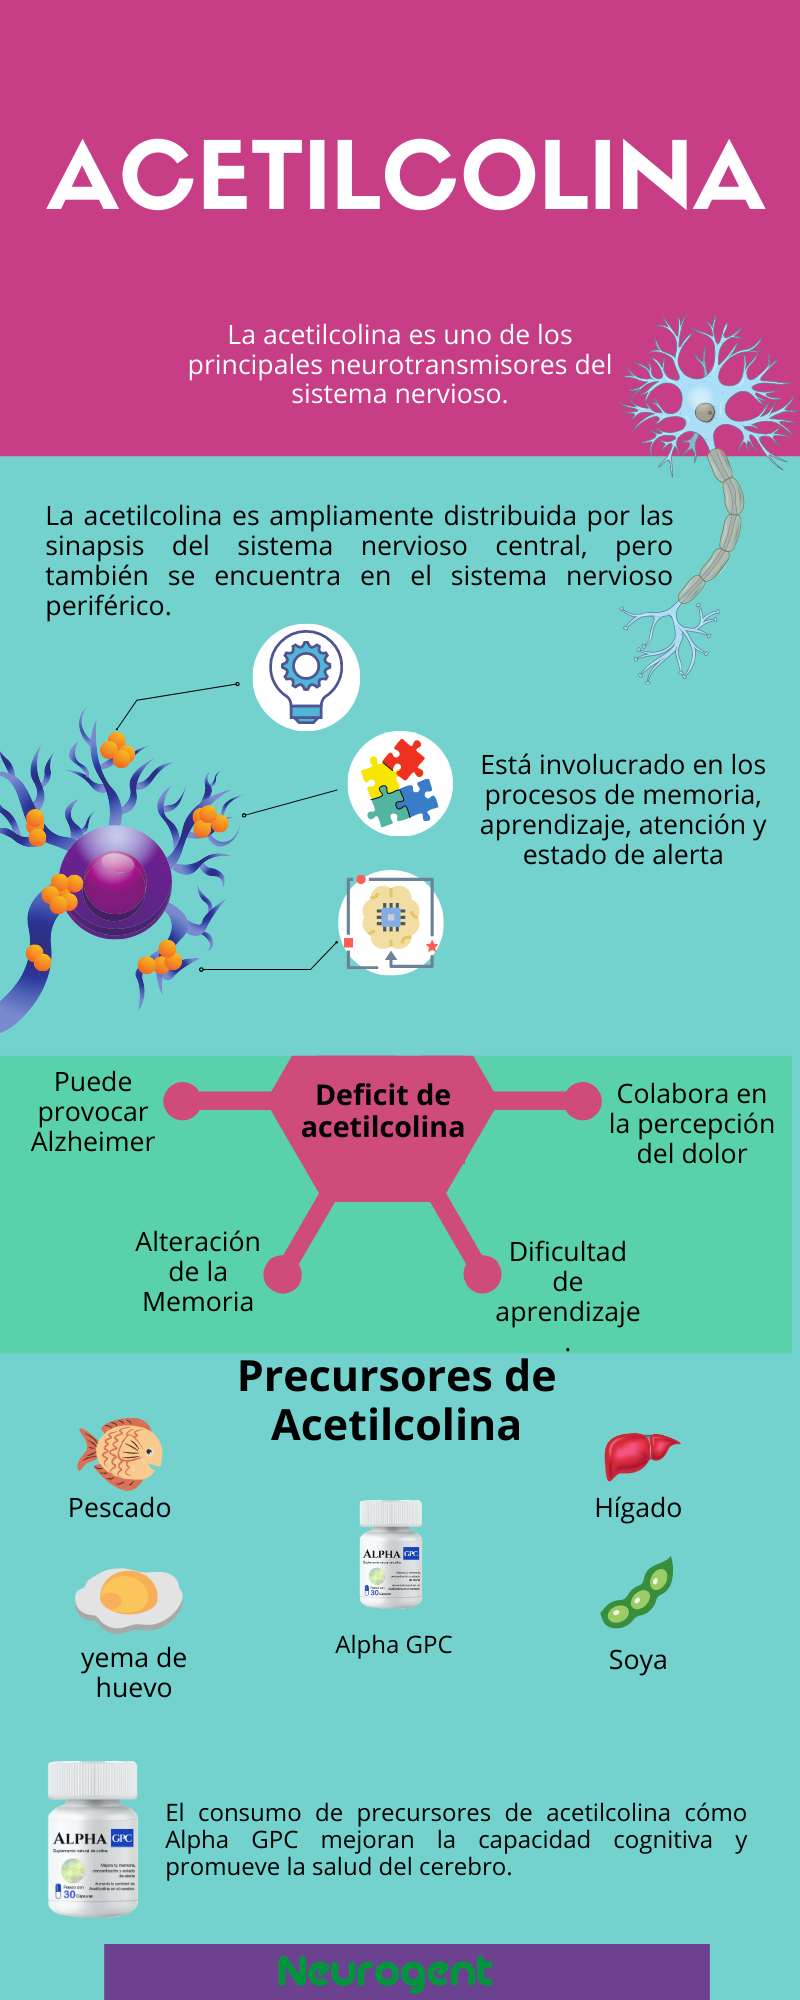 acetilcolina neurotransmisor